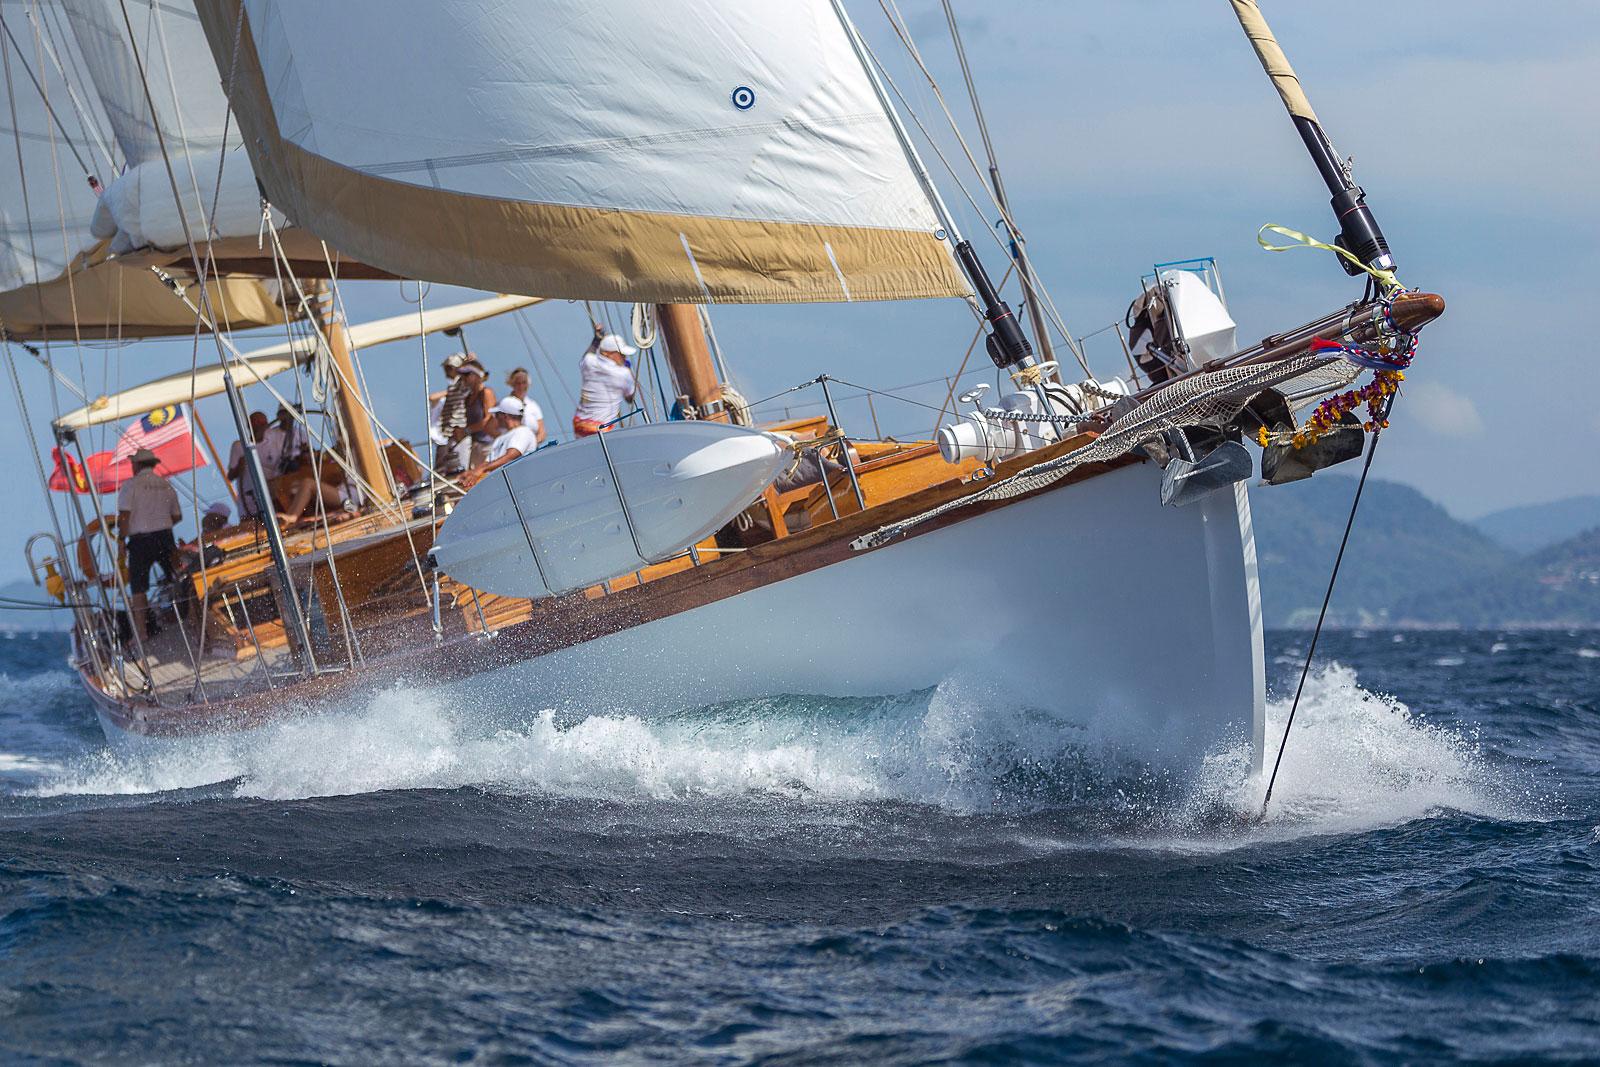 Kata Rocks Superyacht Rendezvous 2016 - SY Aventure